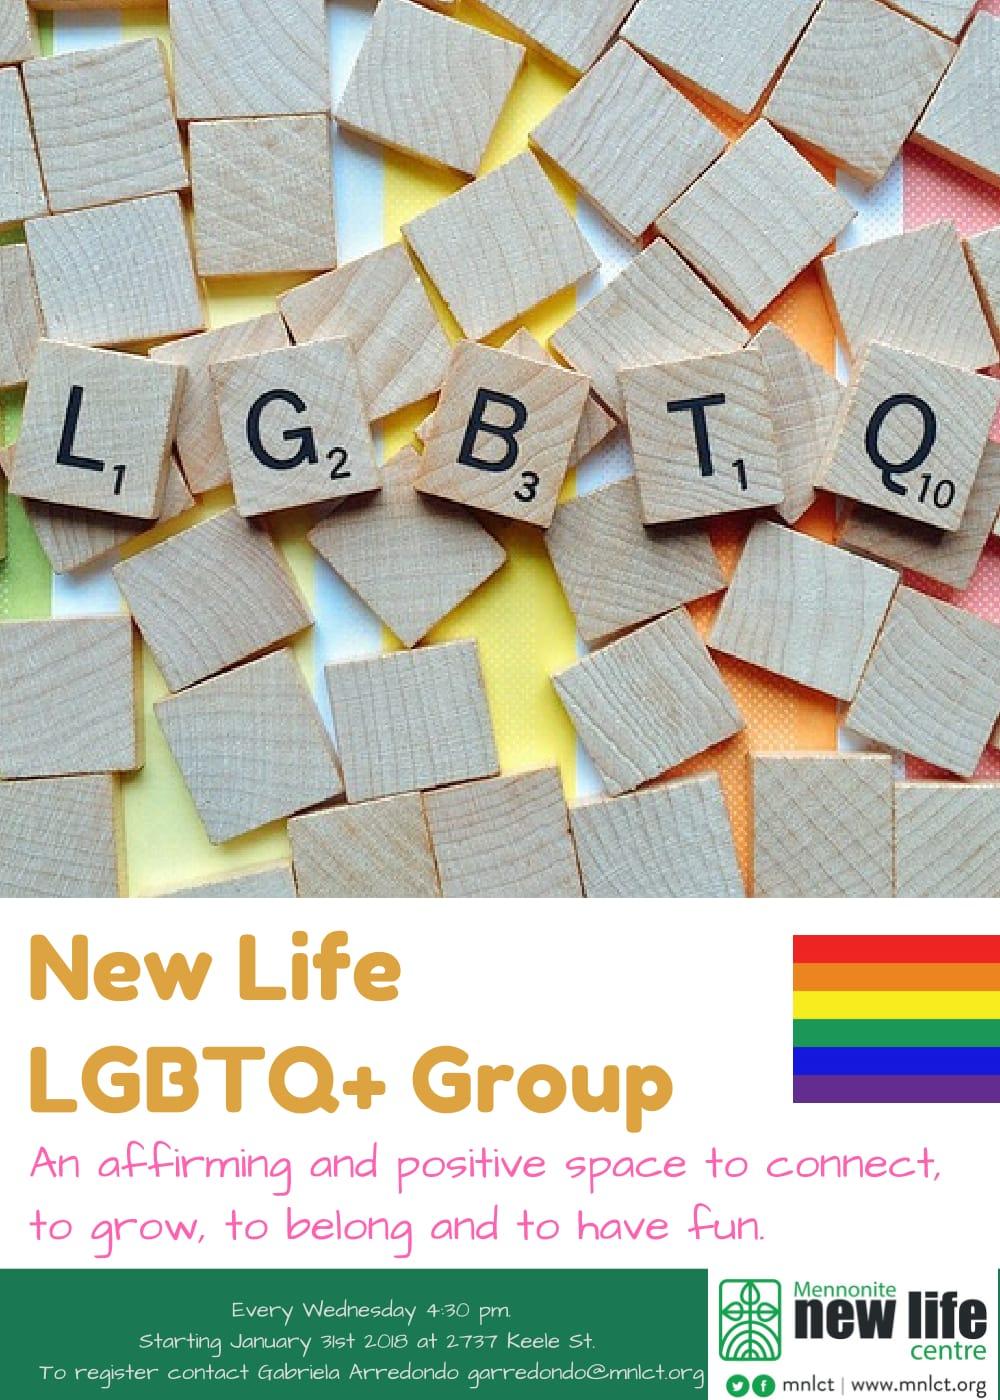 New Life LGBTQ+ Group